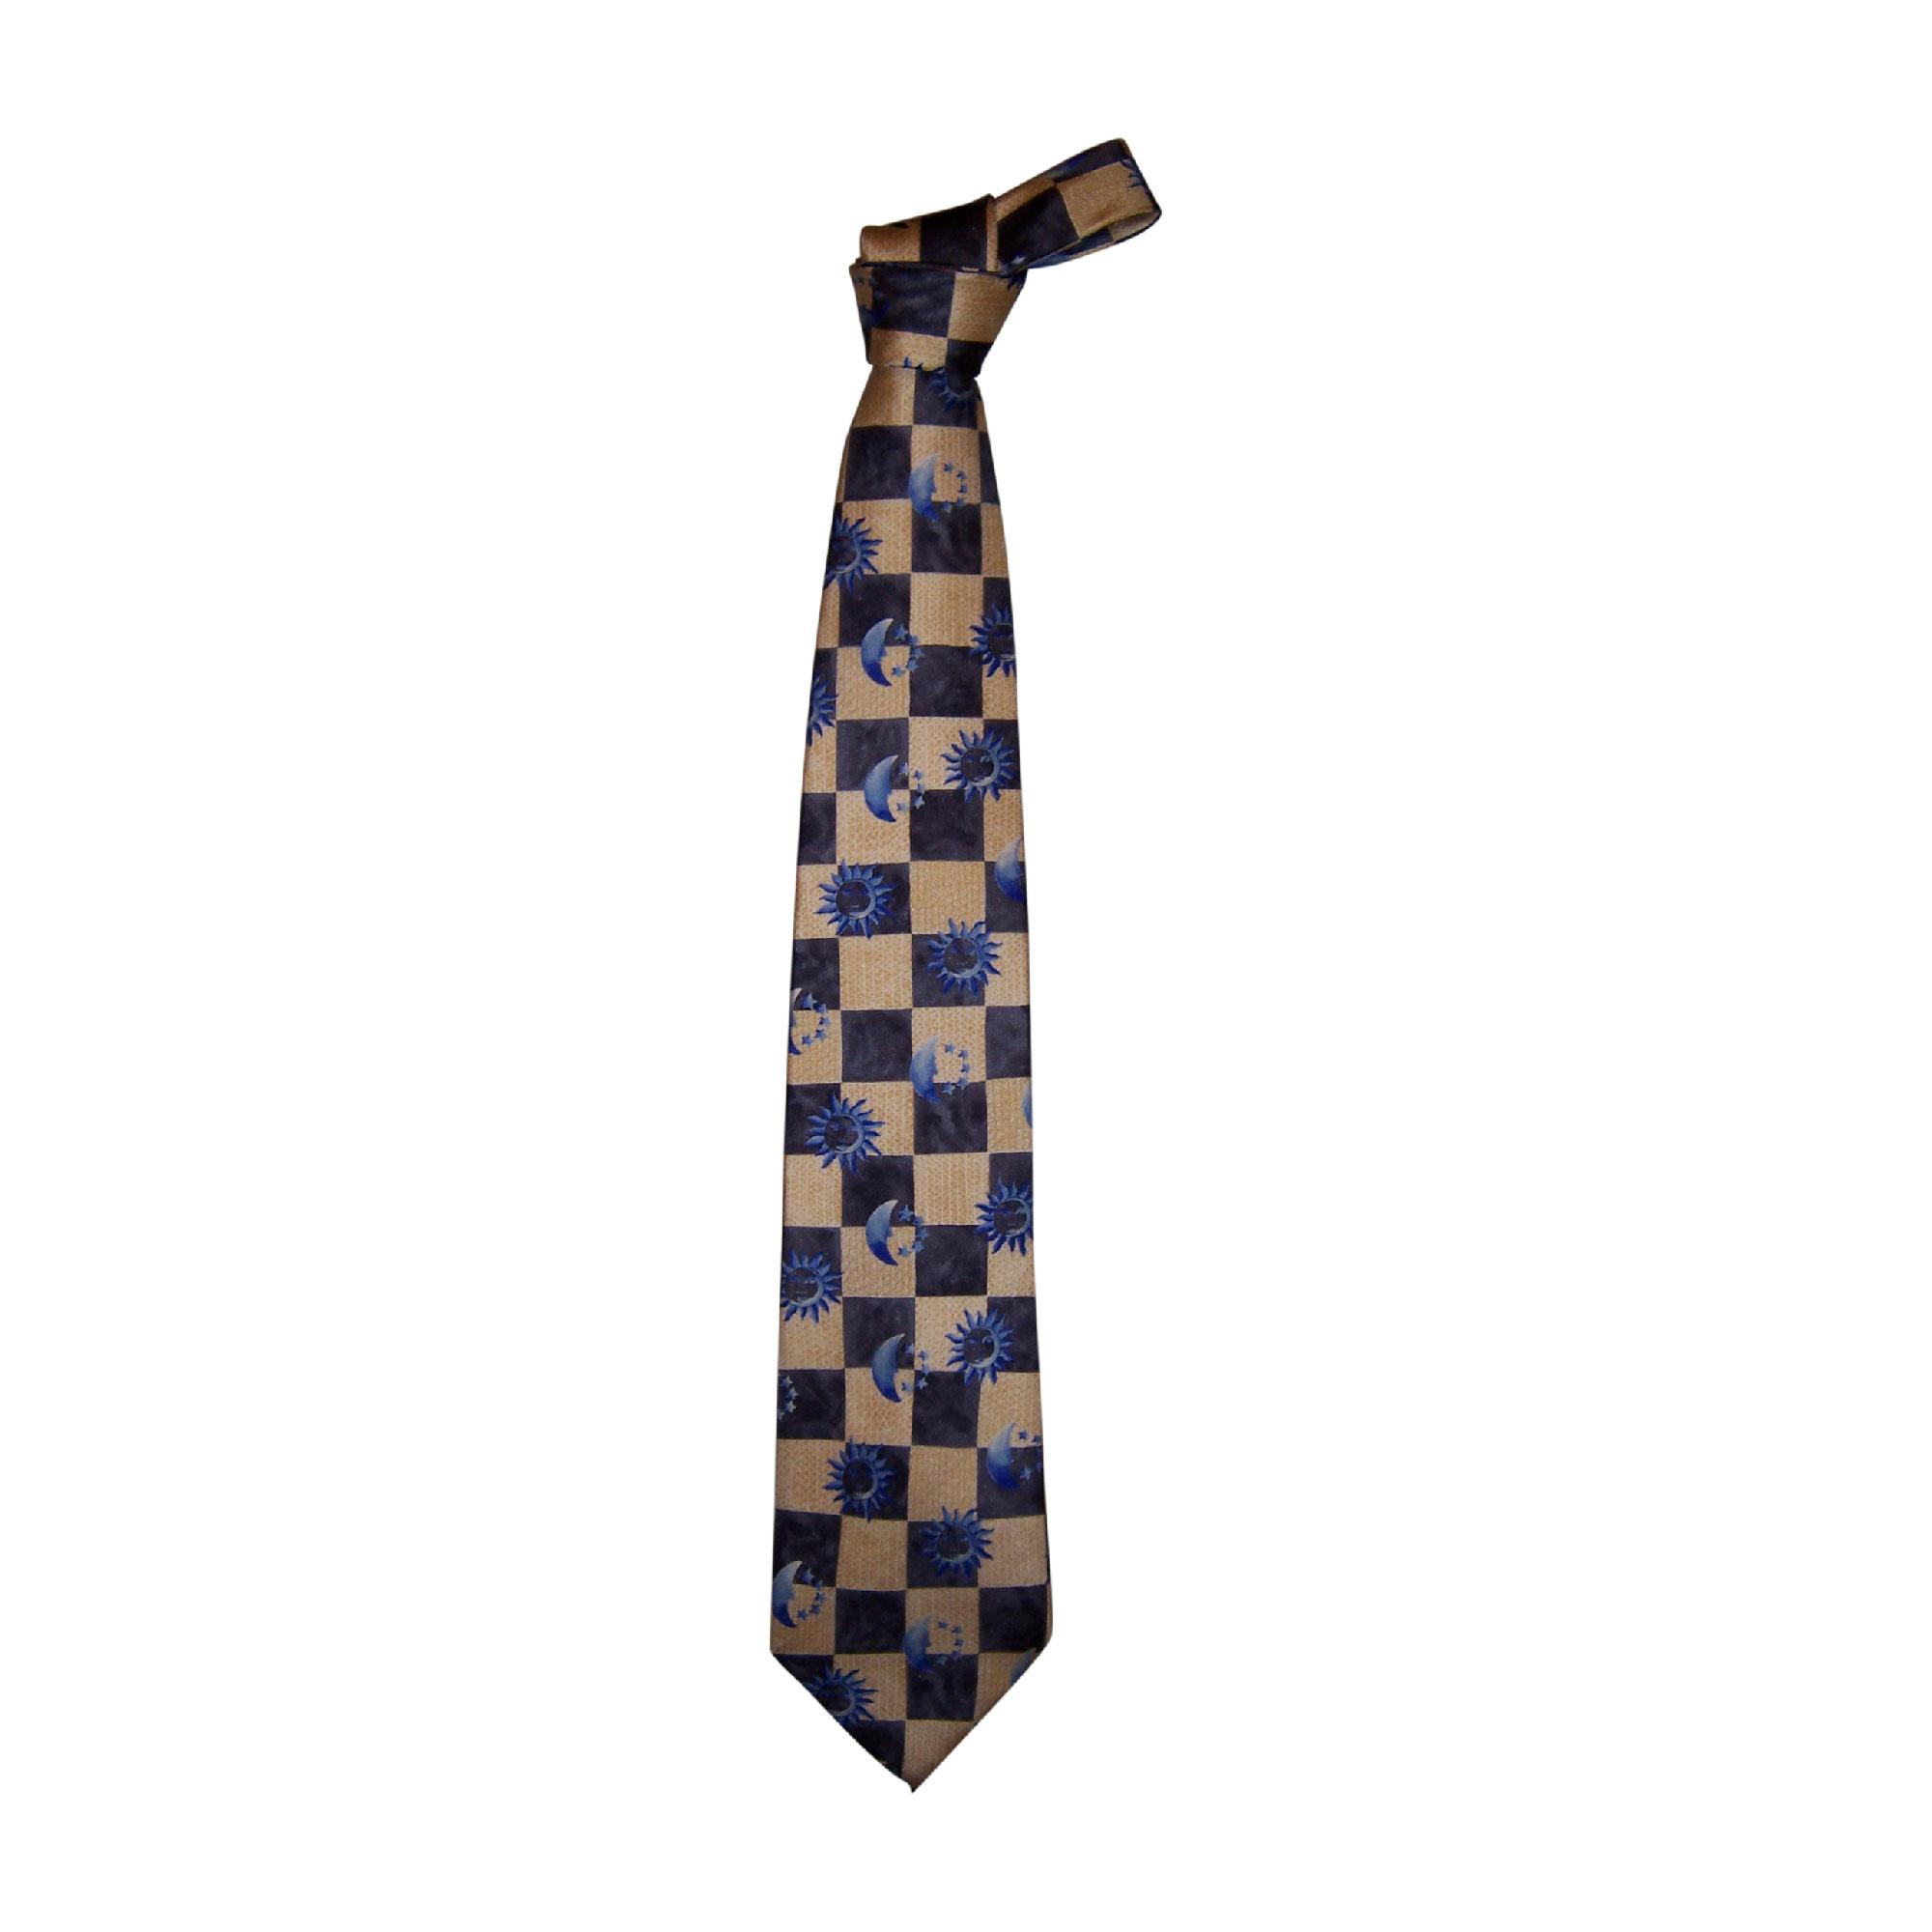 Cravate KARL LAGERFELD gris, ocre, bleu